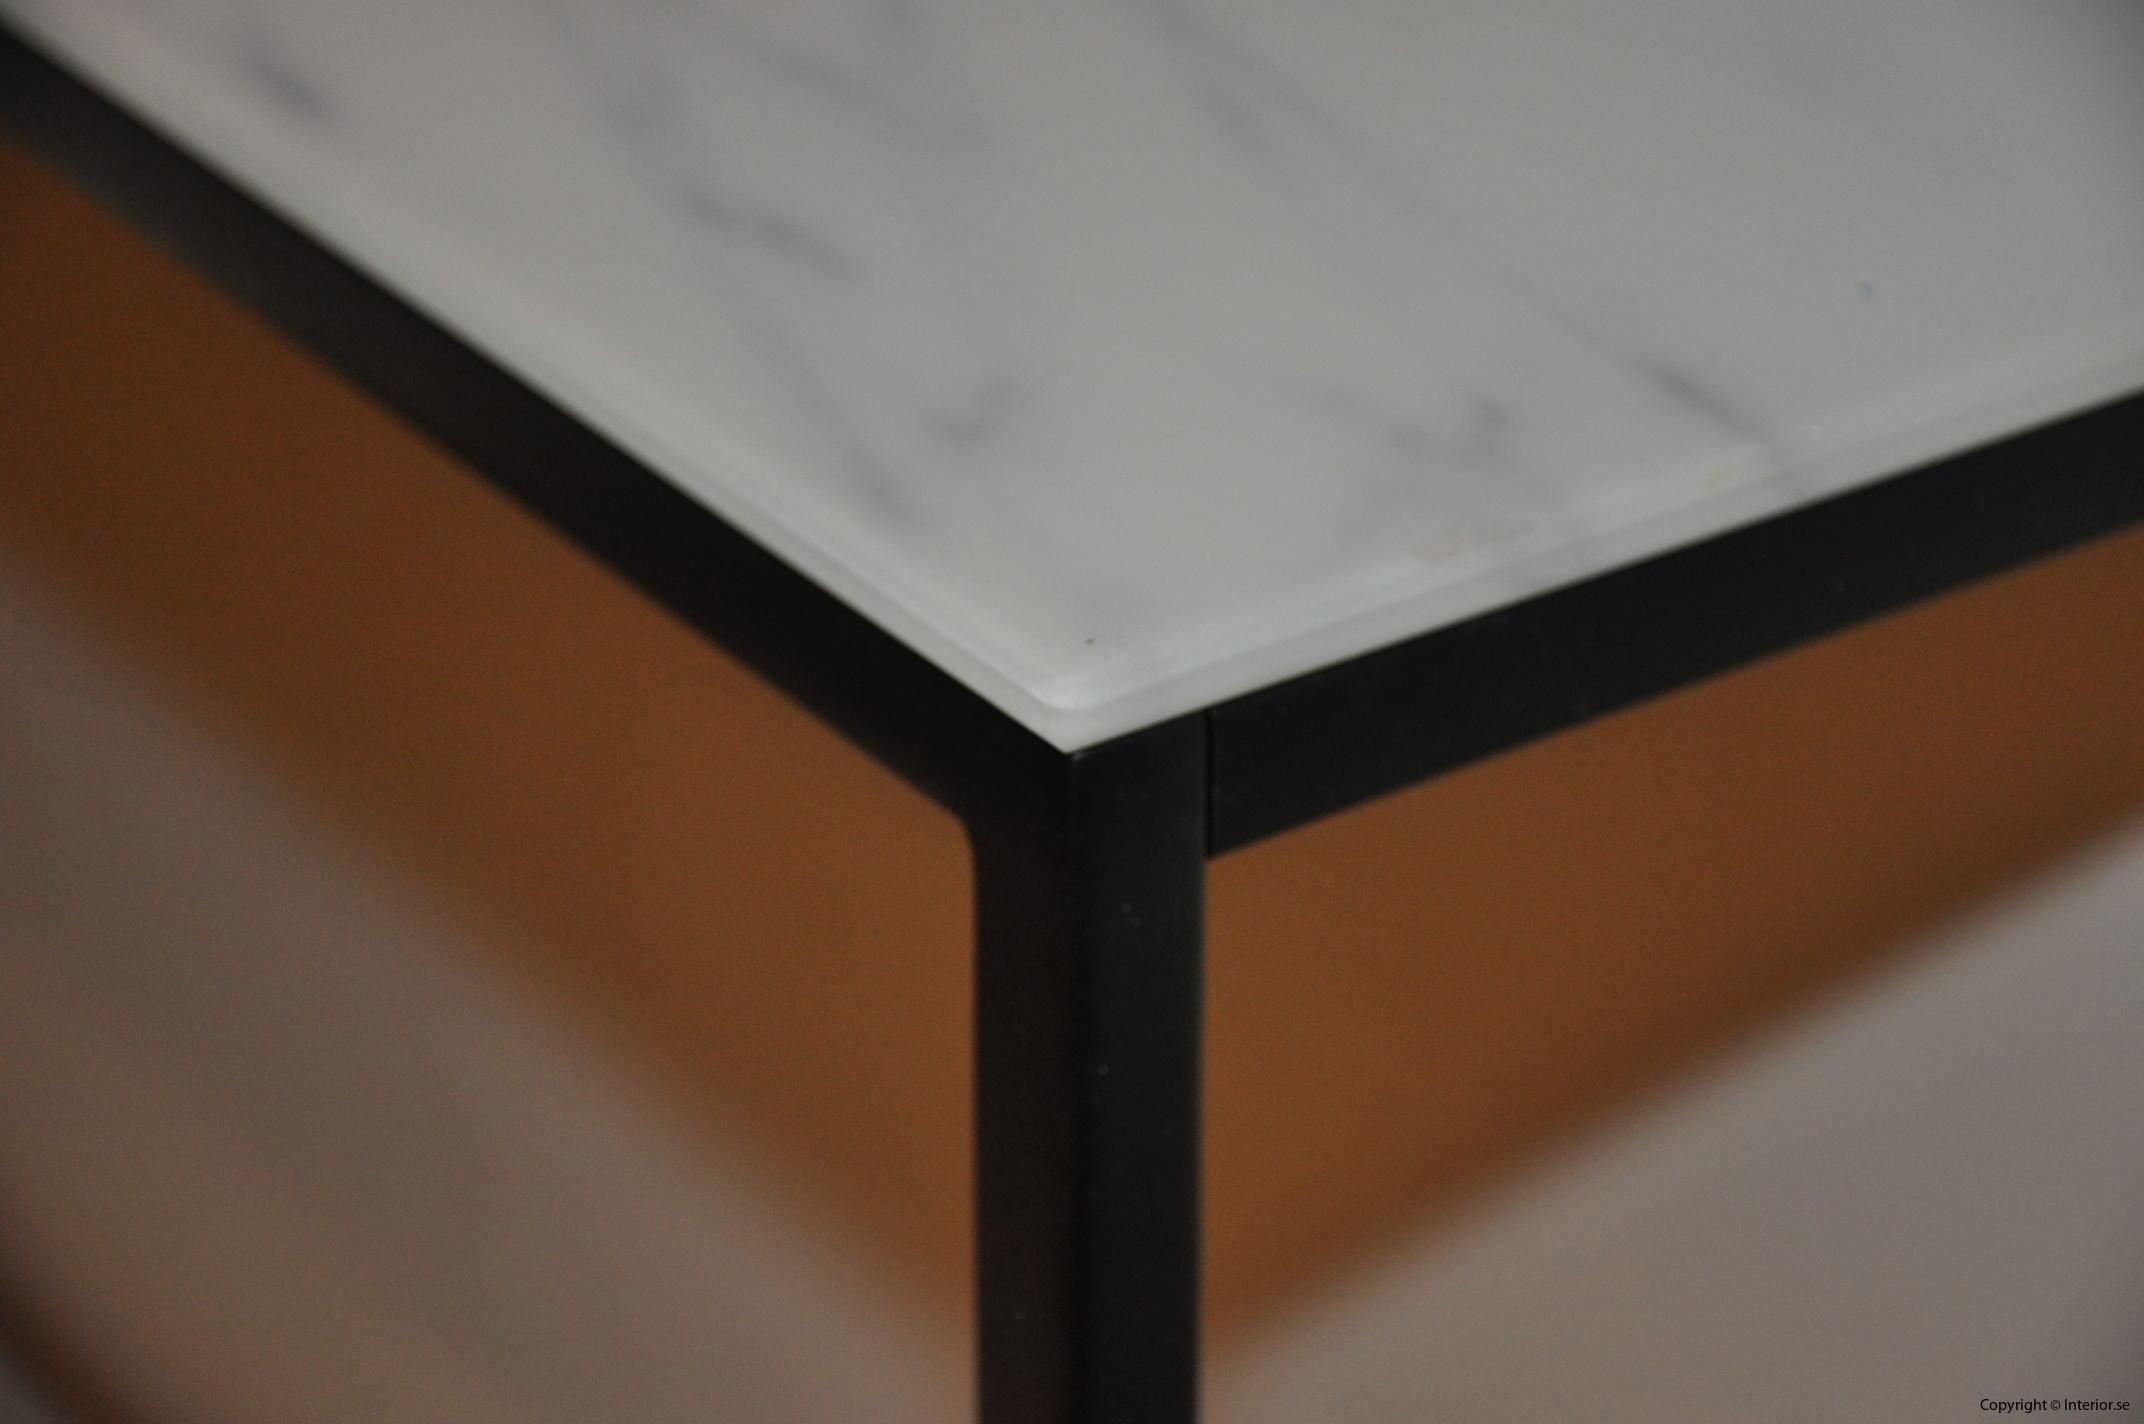 sidebord sideboards mässing (5)